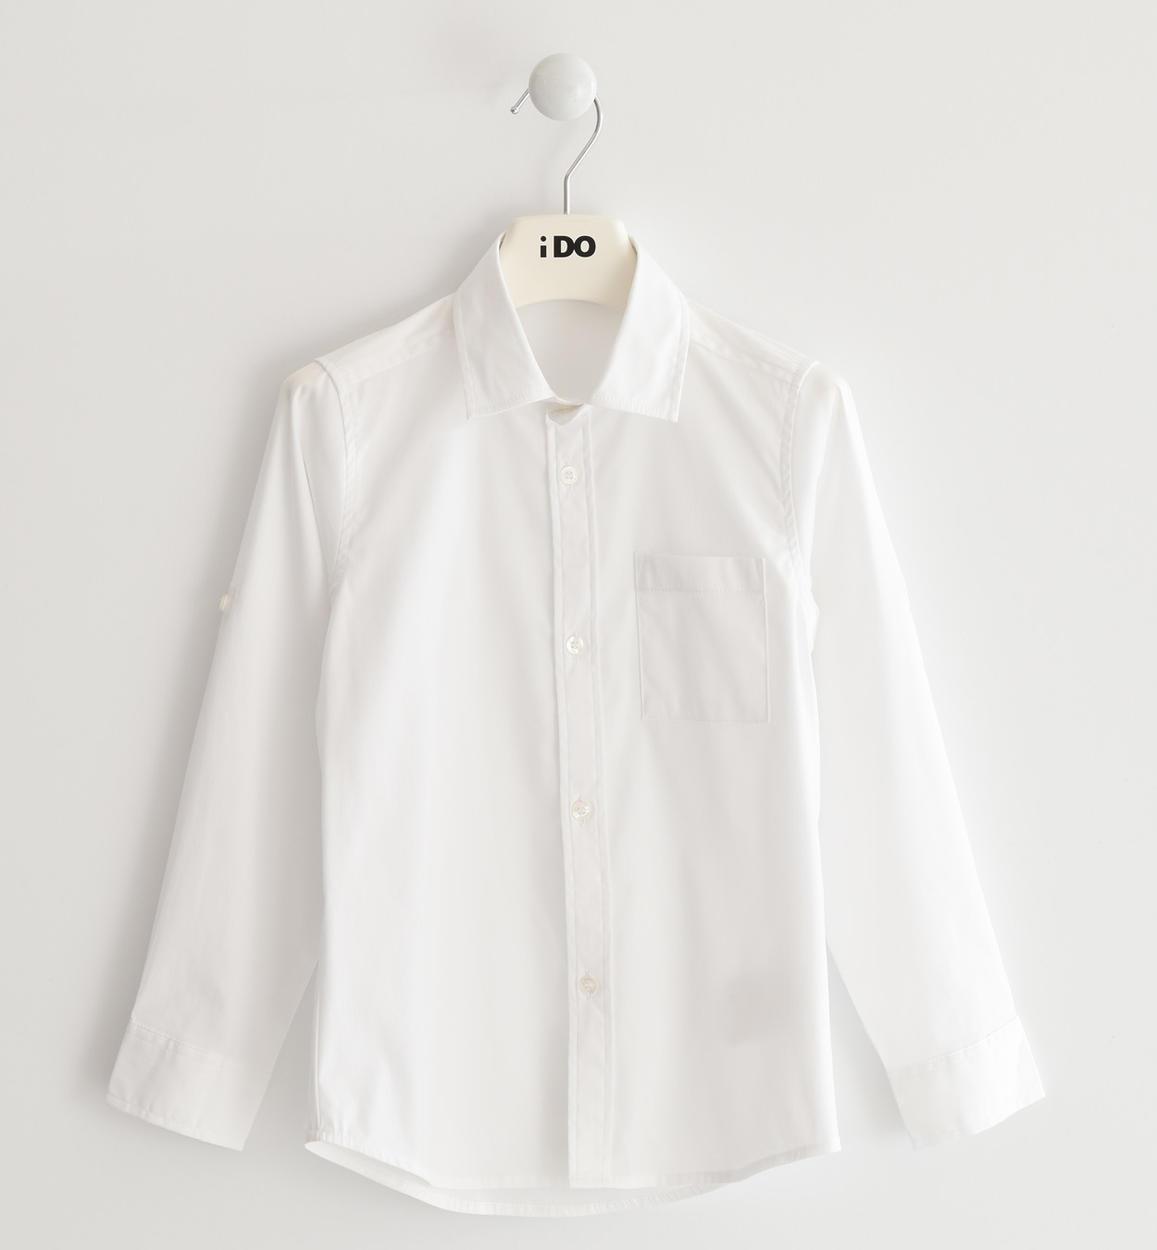 fehér ing fiú alkalmi